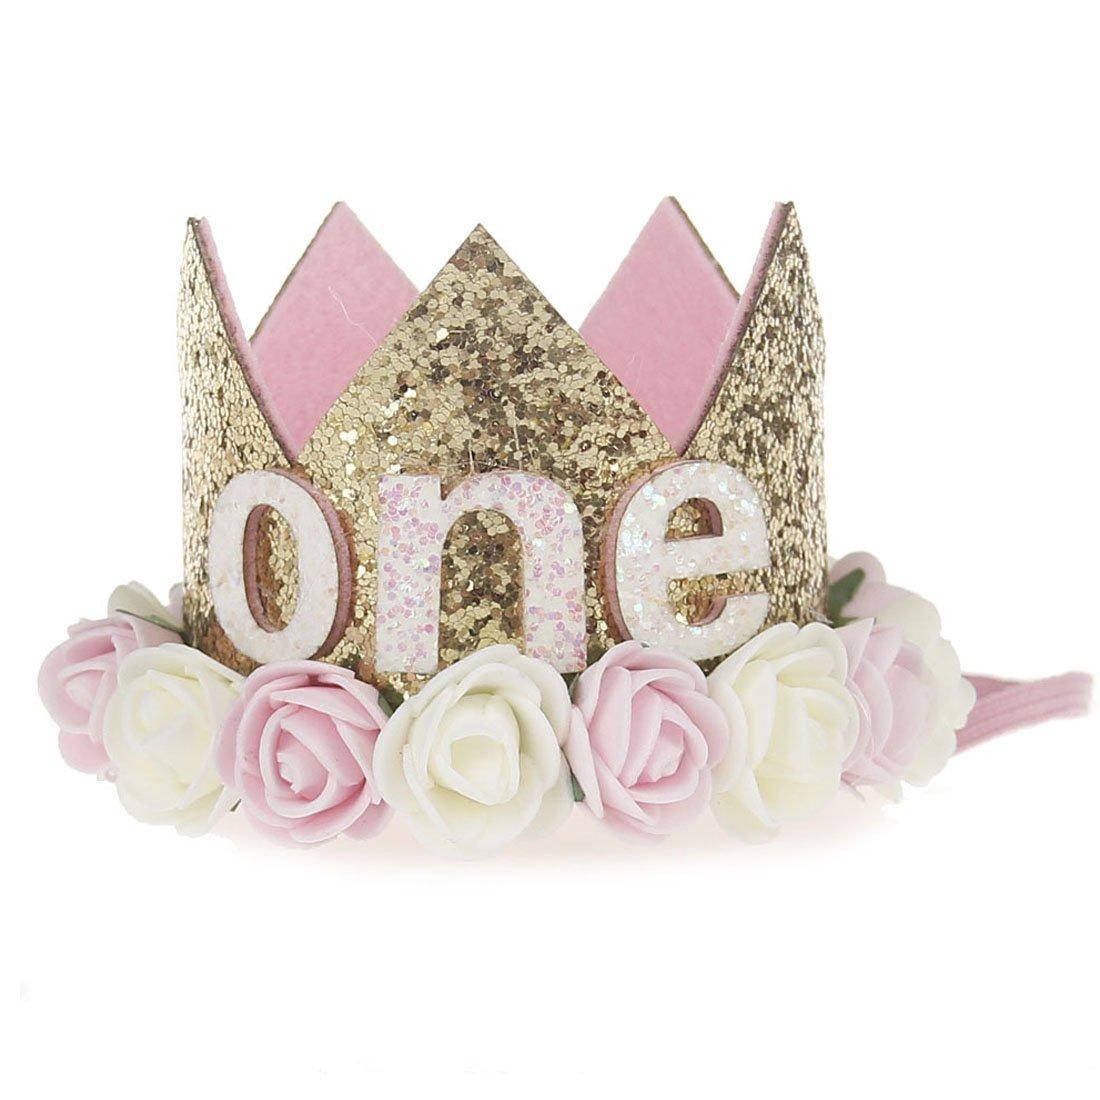 Topcoco Birthday Crown Baby Girl Flower Headband Birthday Party Hairbands